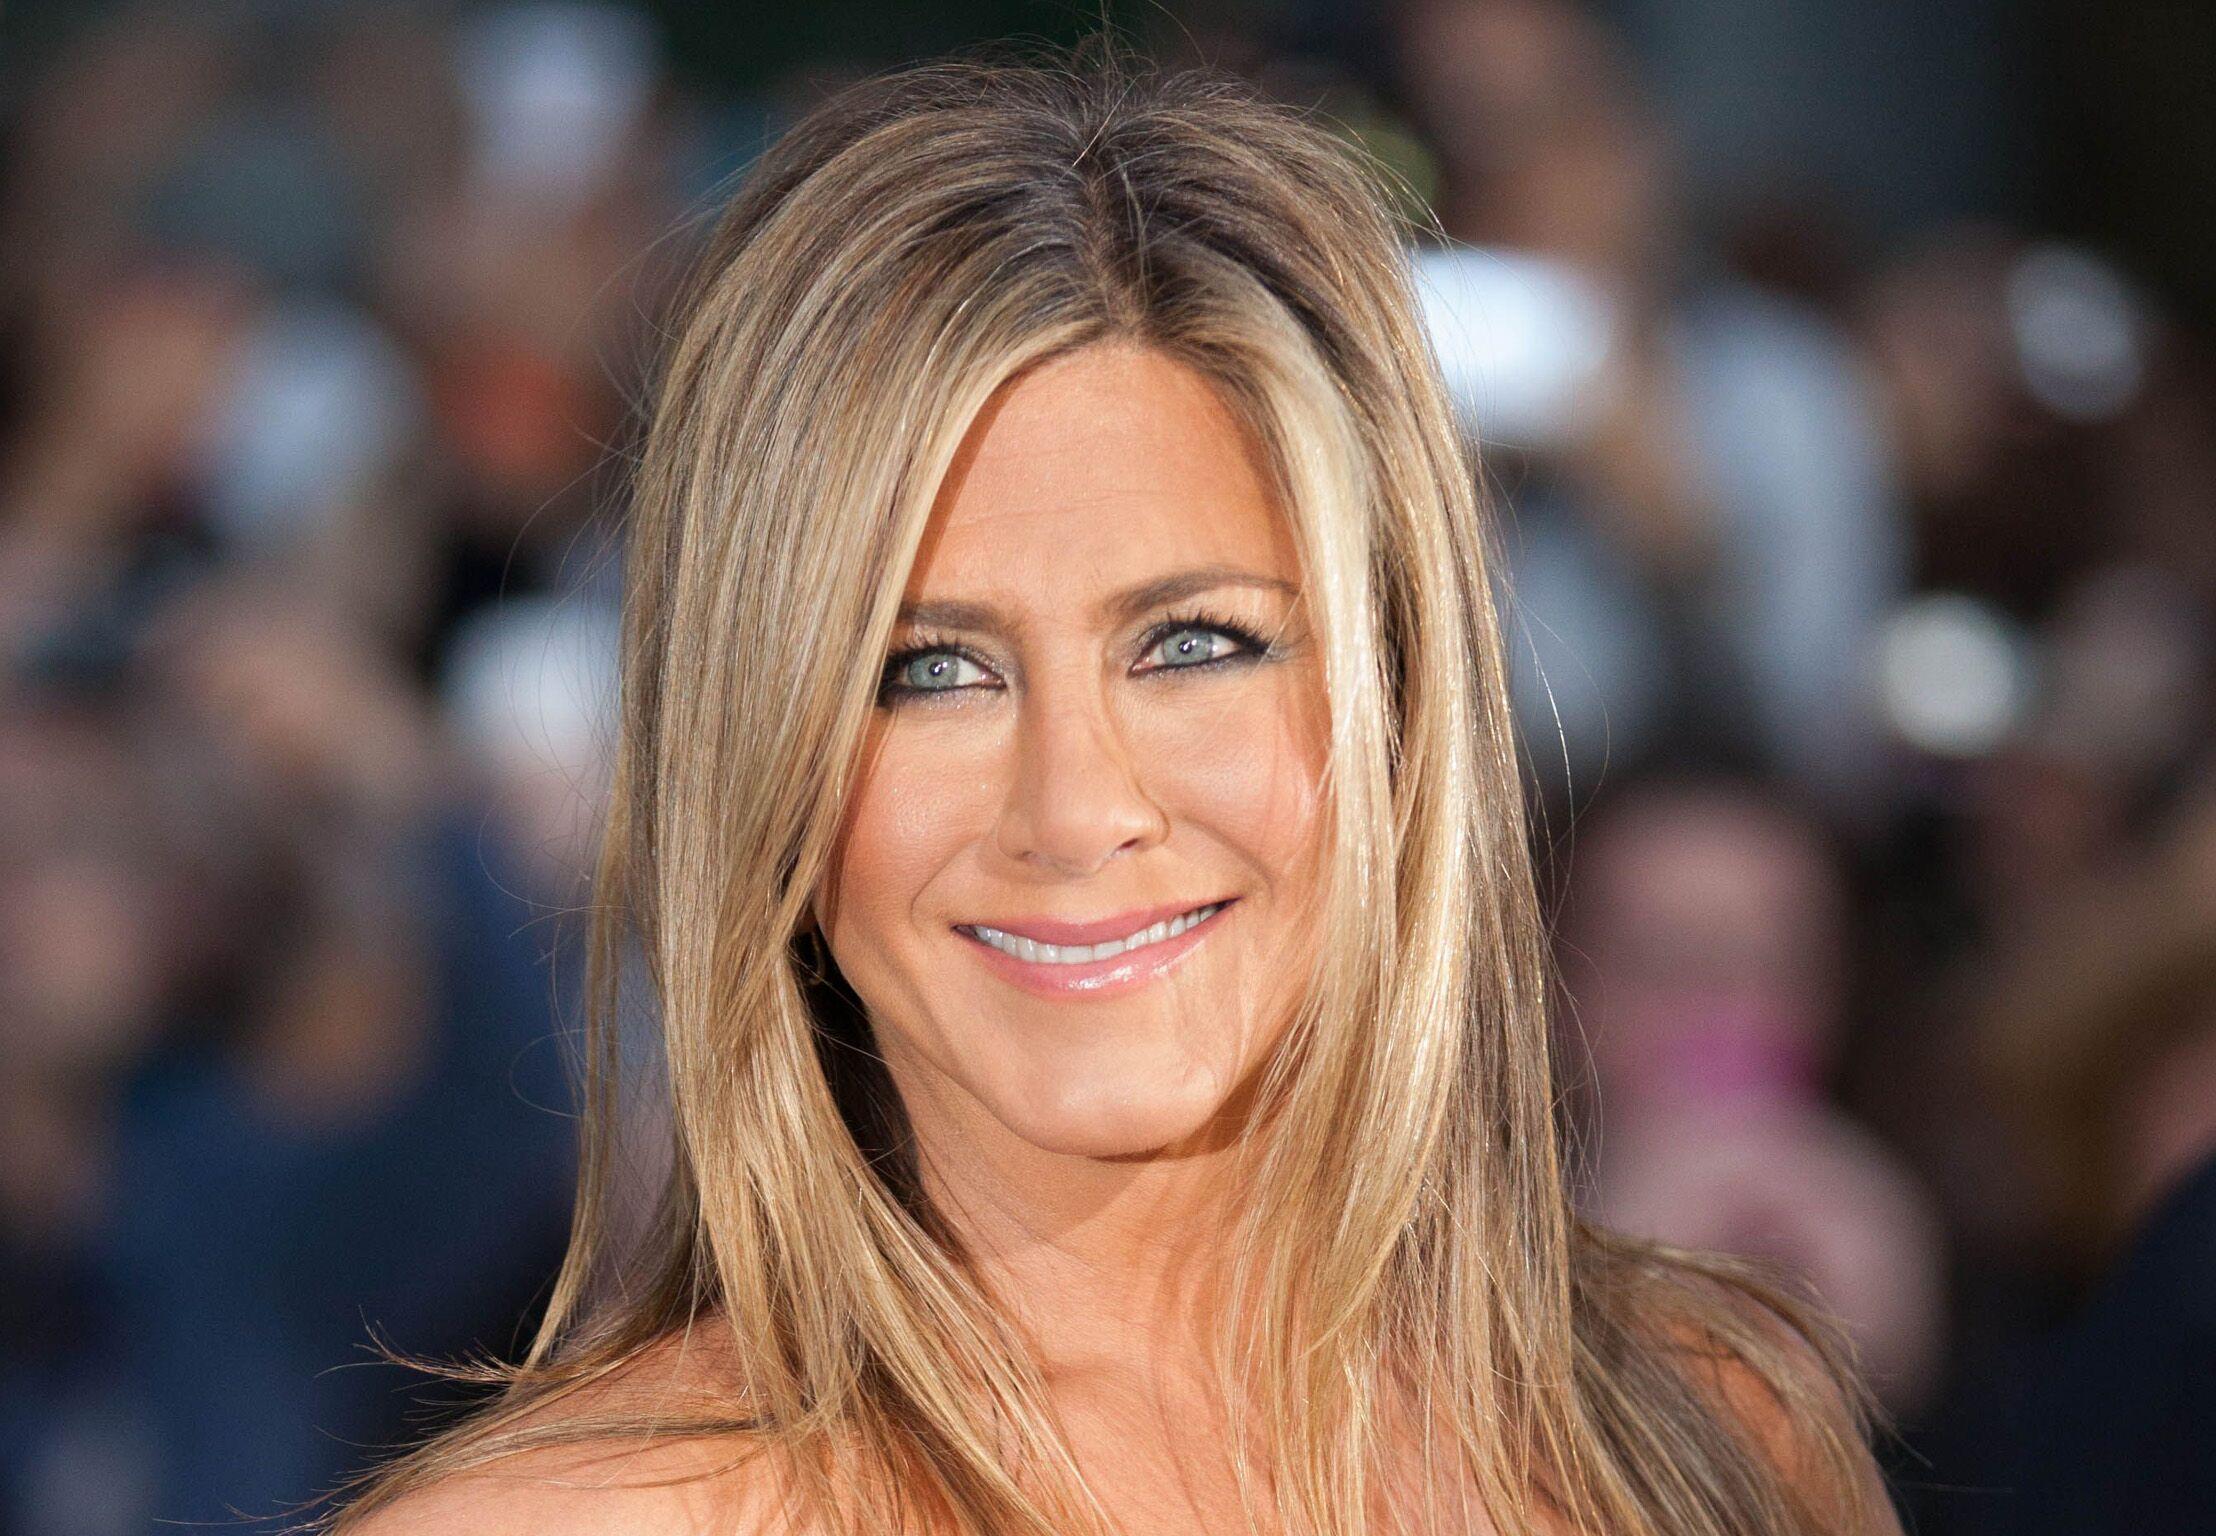 Jennifer Aniston - La biographie de Jennifer Aniston avec Gala.fr